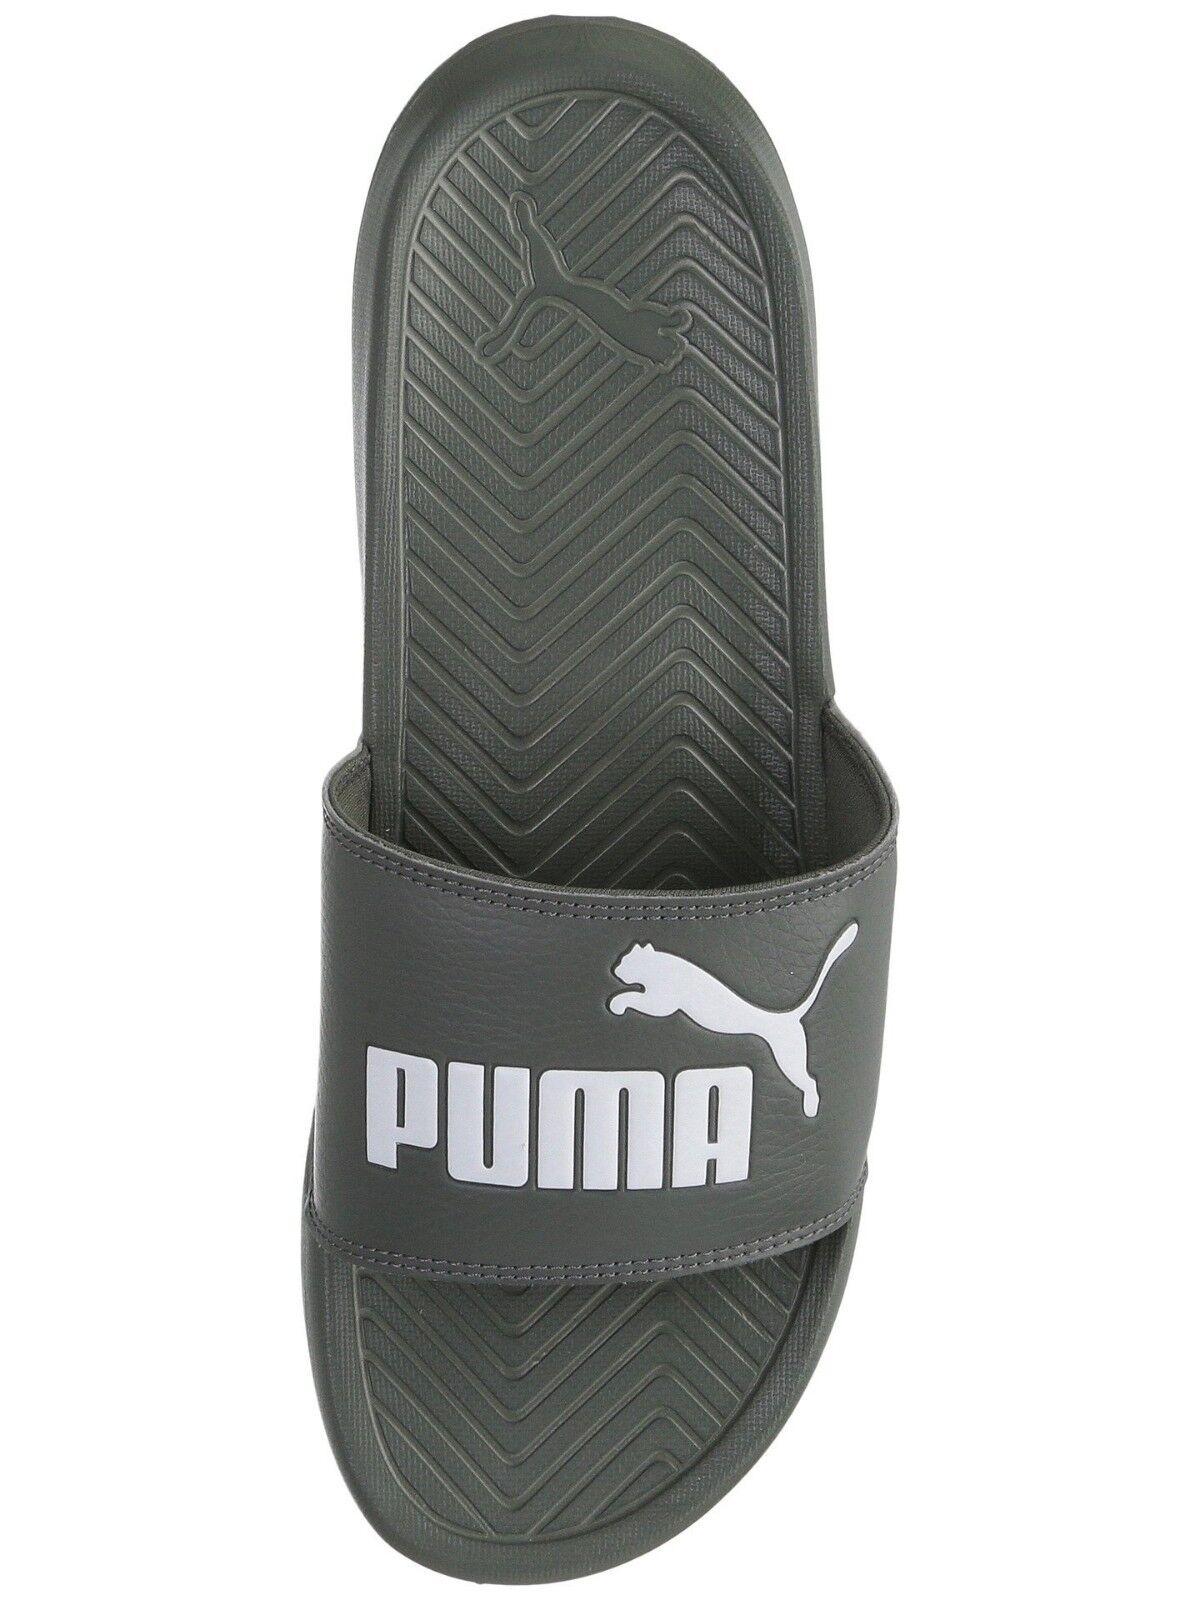 ac9c0456f4c3 PUMA Men s Slip On Sport Slide Sandals flip flops flops flops Slippers Shoes  Popcat Gray bf5292